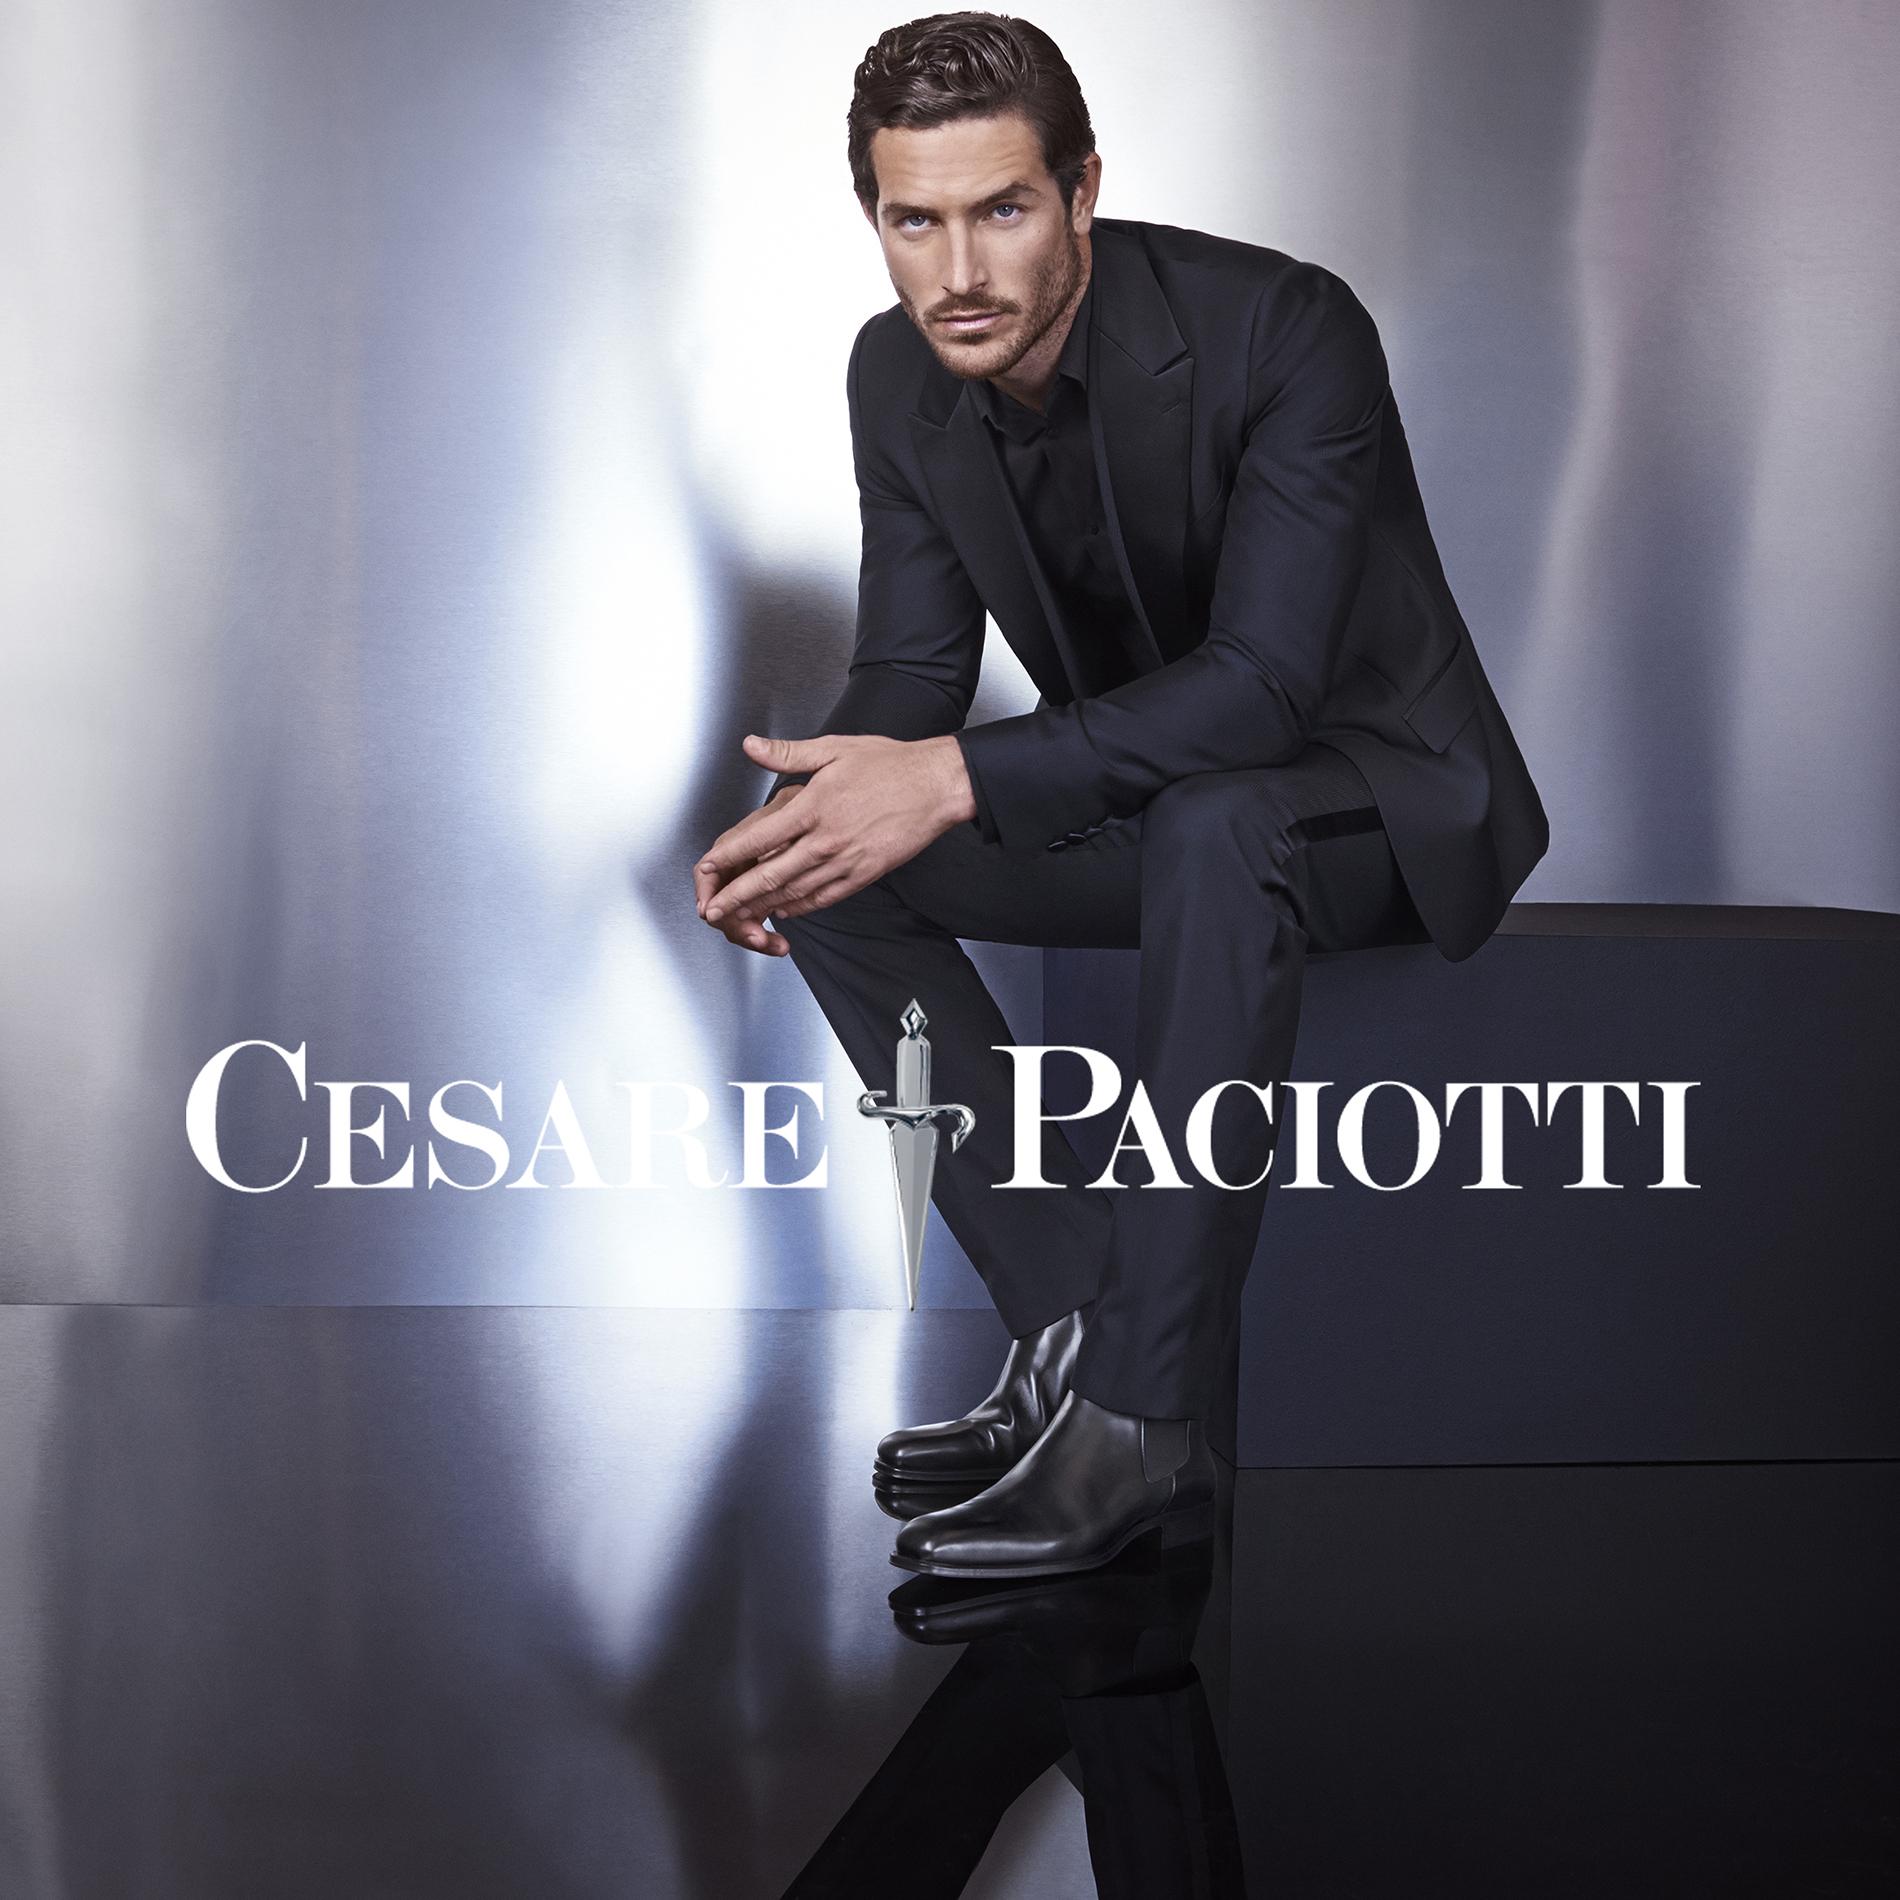 Justice Joslin Fronts Cesare Paciotti's Fall/Winter 2015 Campaign